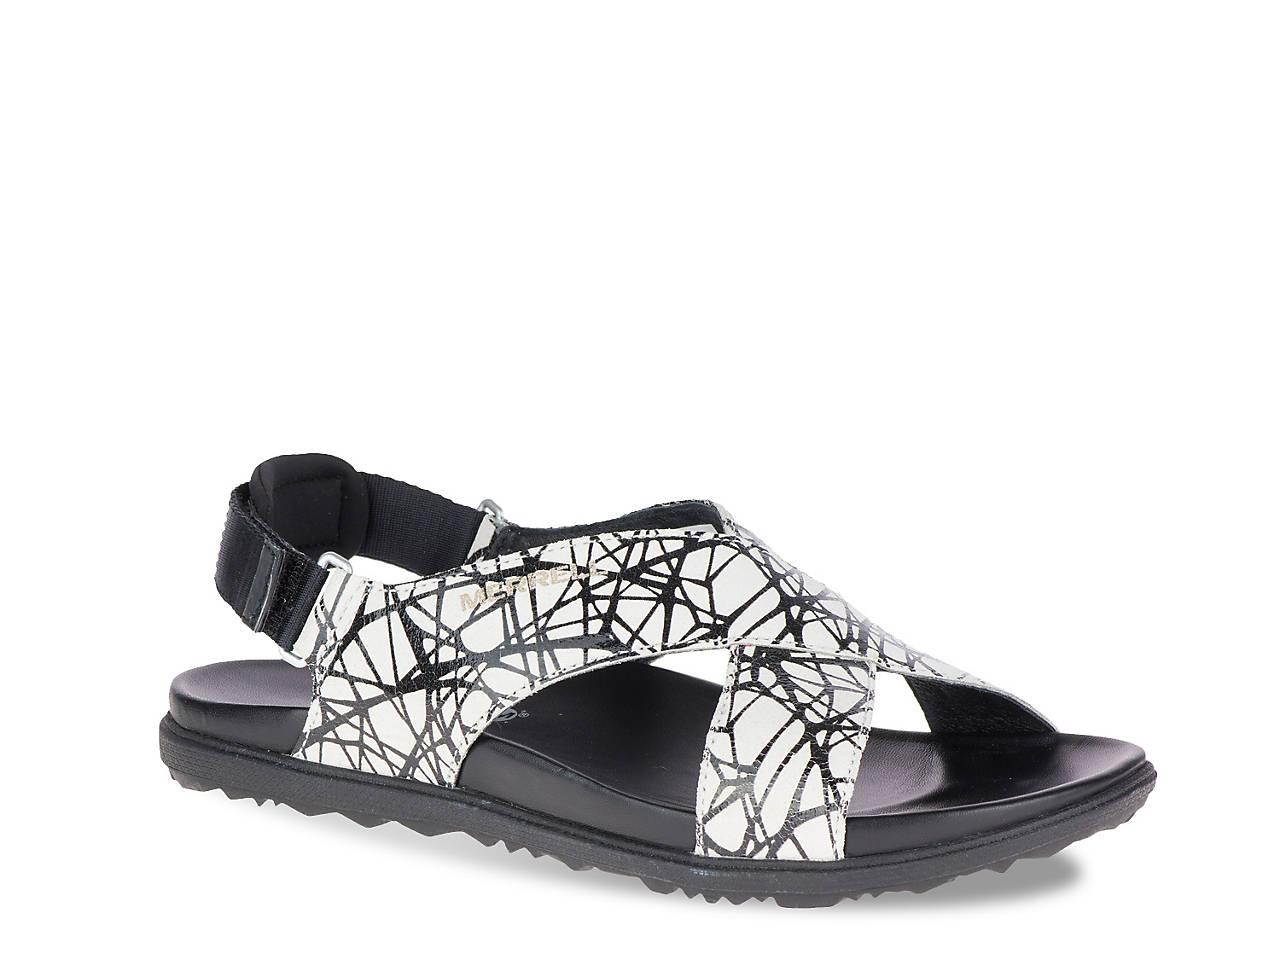 e4cbcaac8a6 Merrell Around Town Sunvue Sandal Men s Shoes